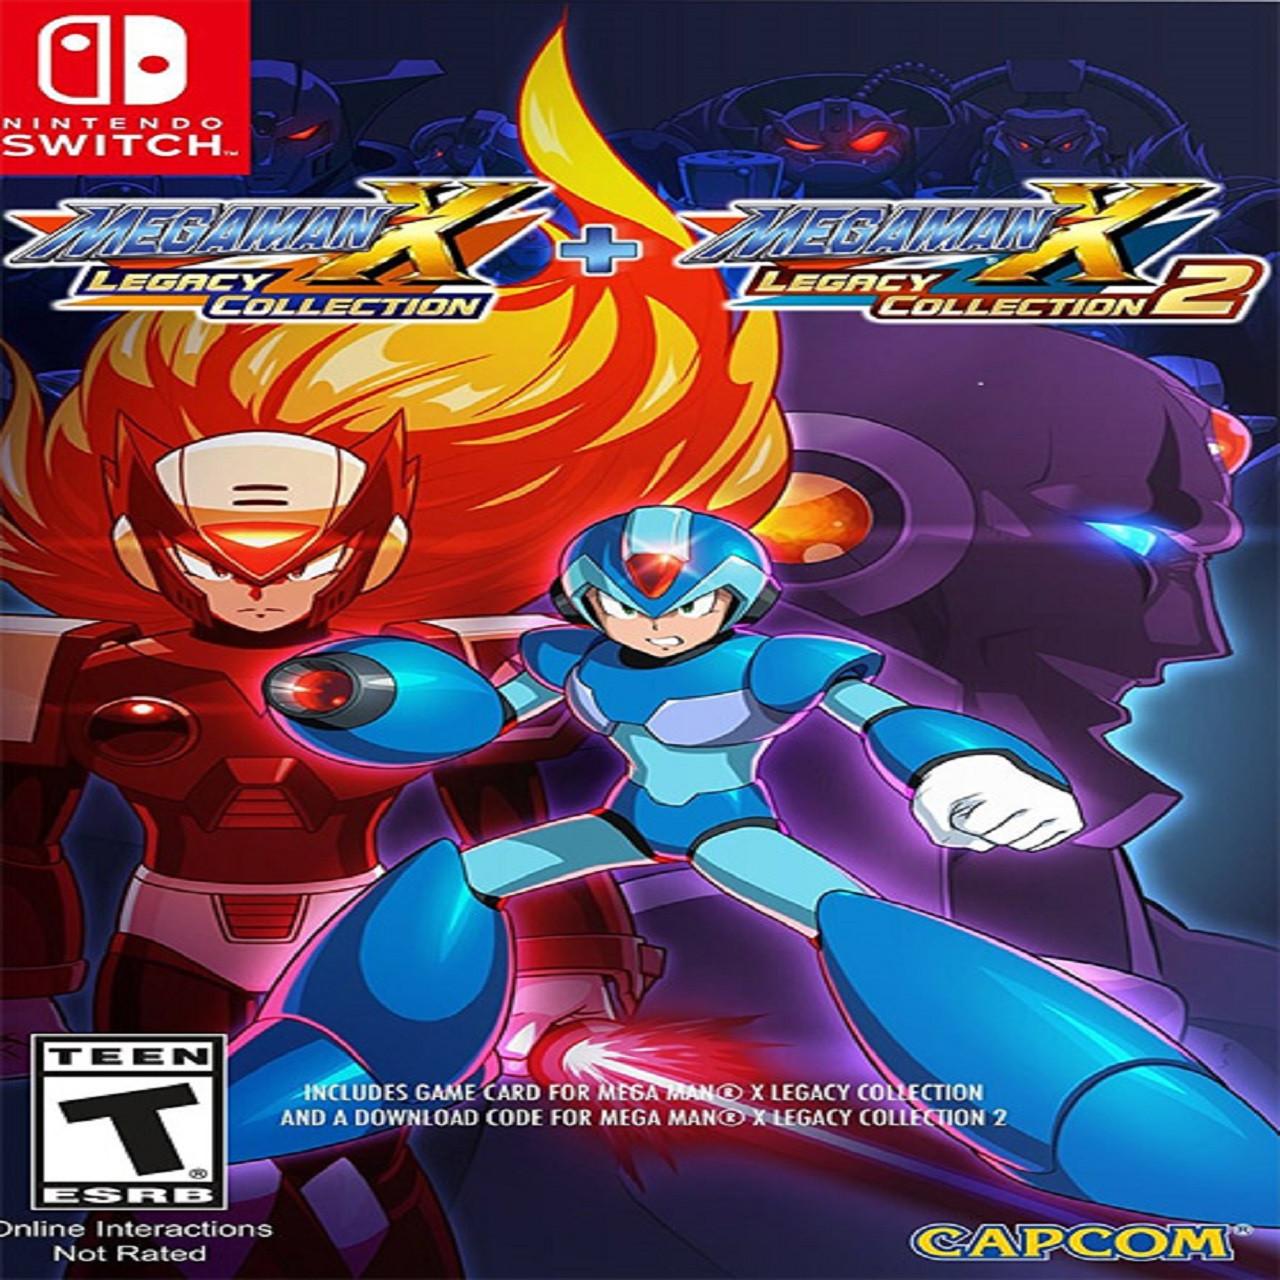 Mega Man X: Legacy Collection 1 + 2 Nintendo Switch (NEW)